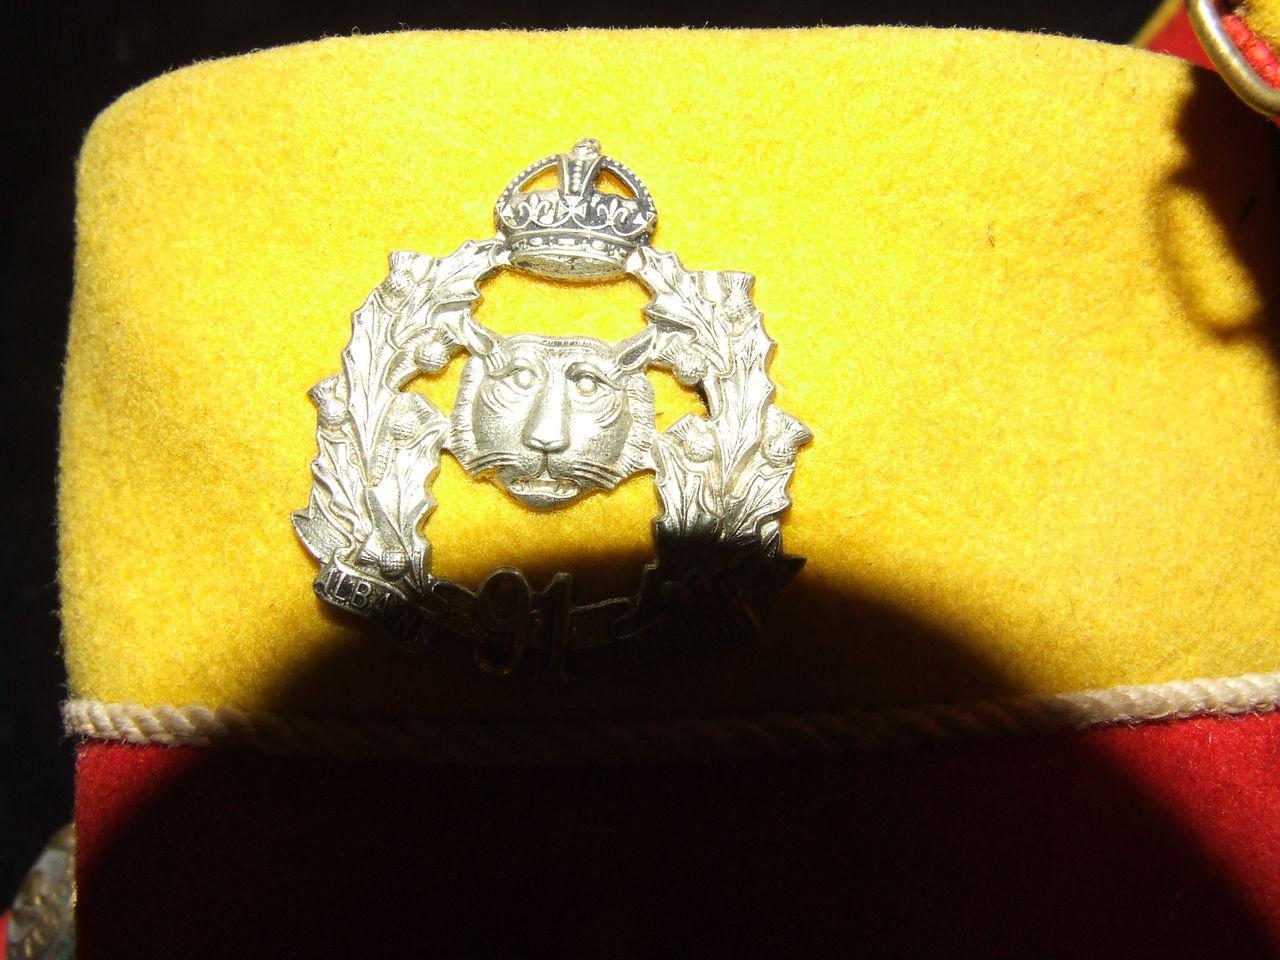 91st Canadian Highlanders Uniform 001